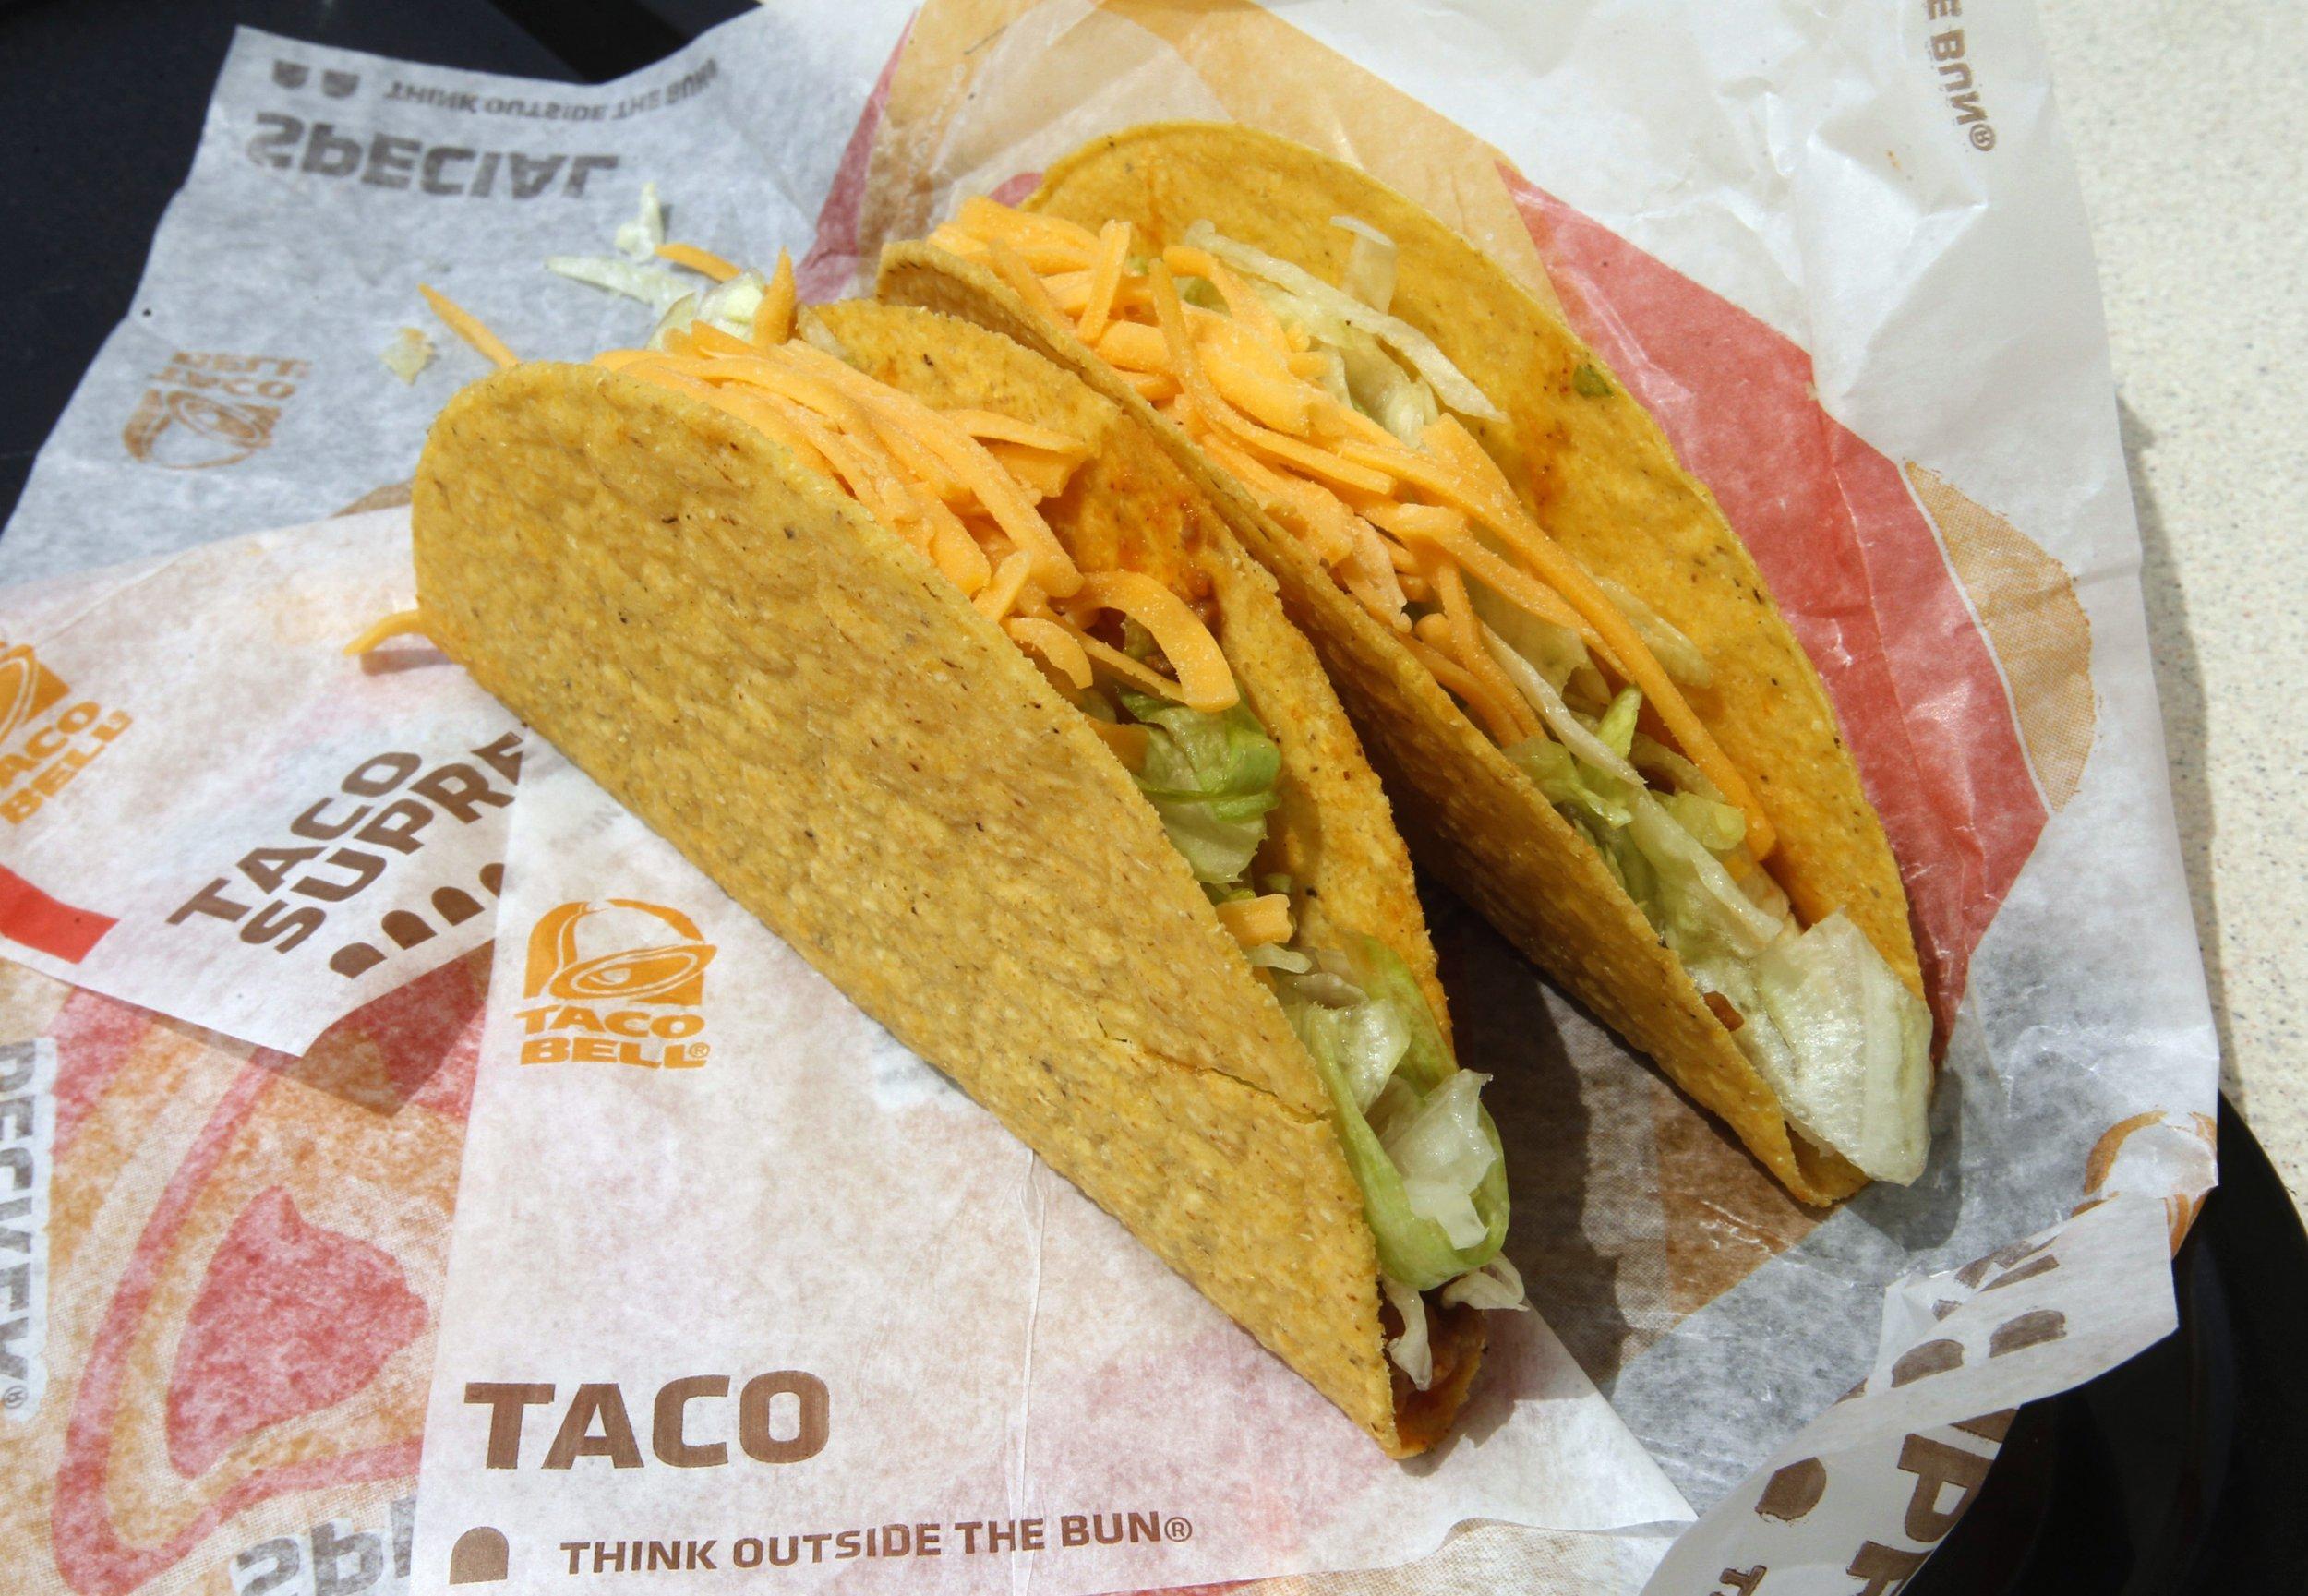 taco bell menu calories pdf